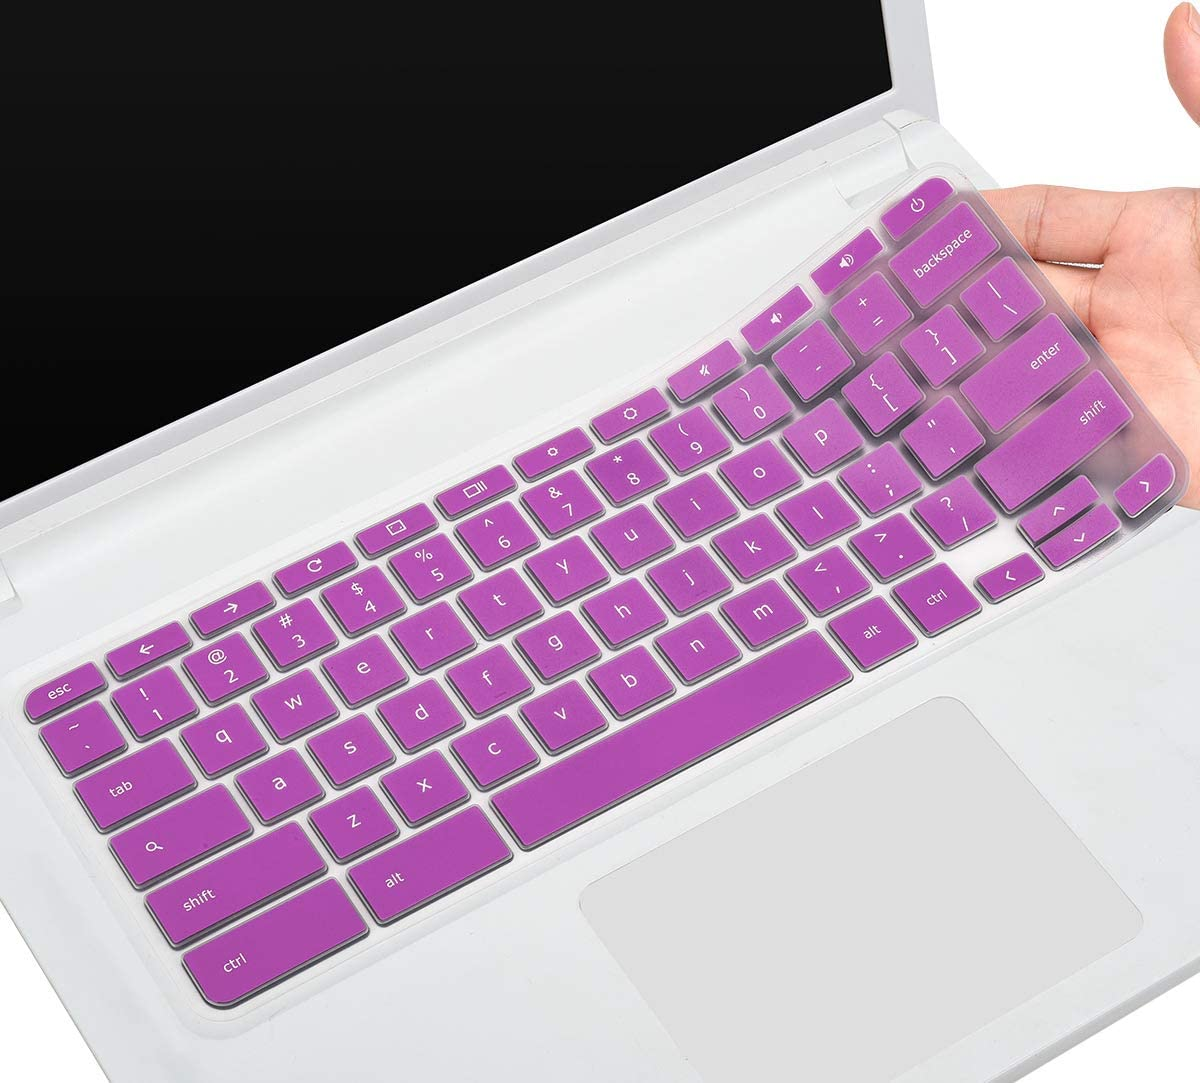 CaseBuy Keyboard Skin Cover Compatible11.6 Acer Chromebook 11 CB3-131 CB3-132 / Chromebook R 11 CB5-132T / 13.3